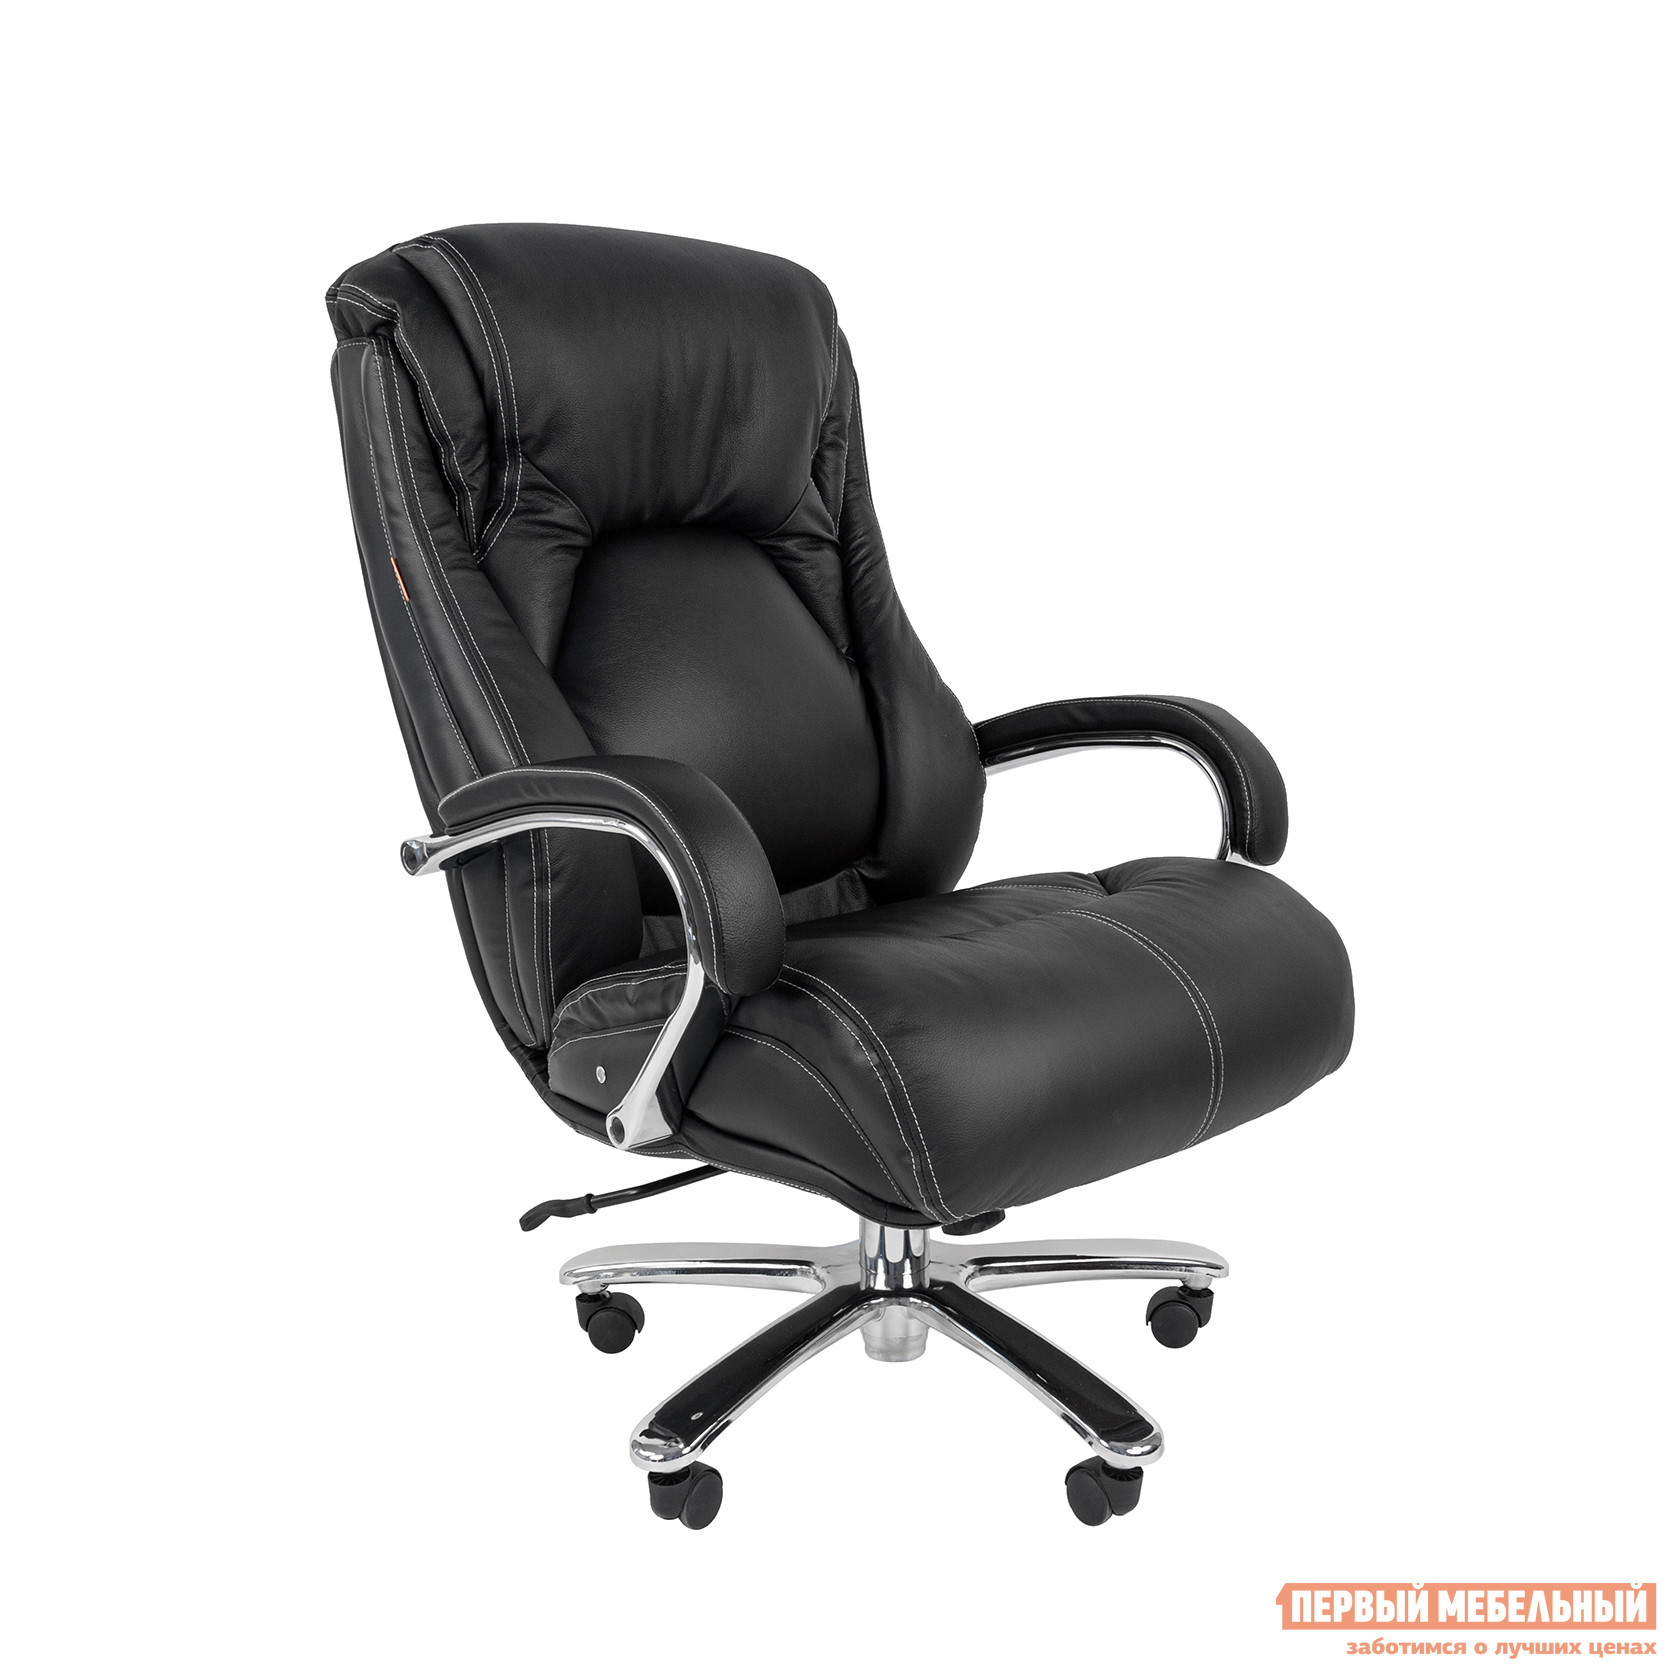 цена Кресло руководителя для большого веса Тайпит CHAIRMAN 402